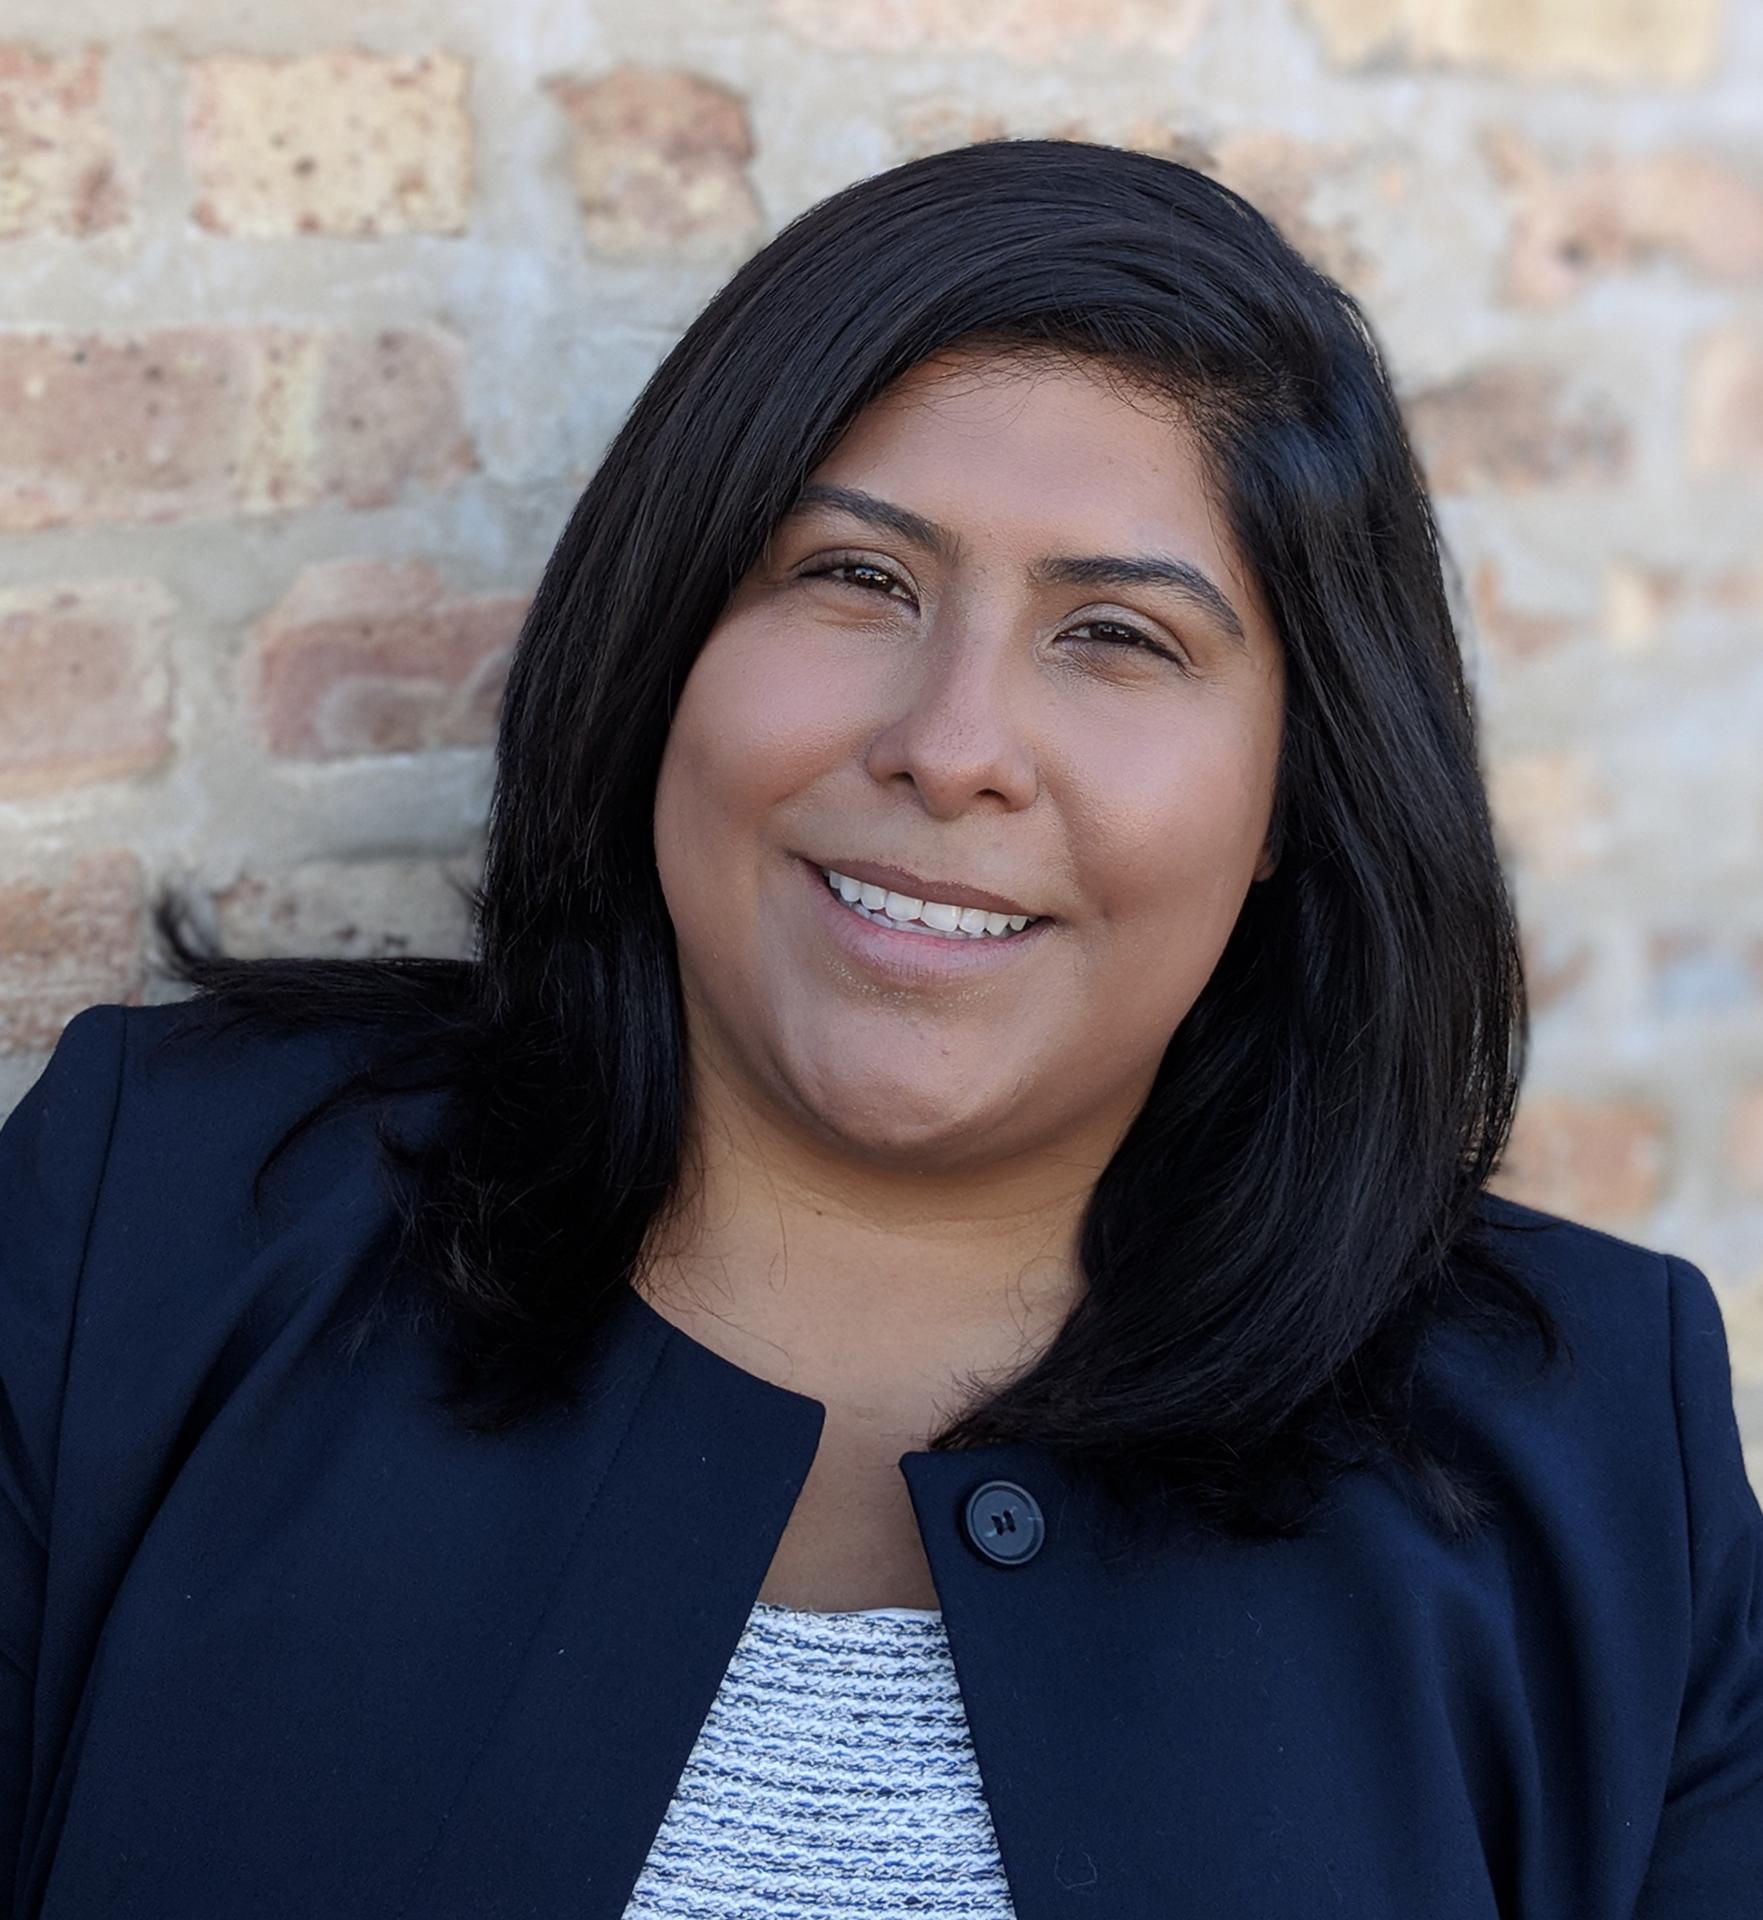 Ms. Lara Perez